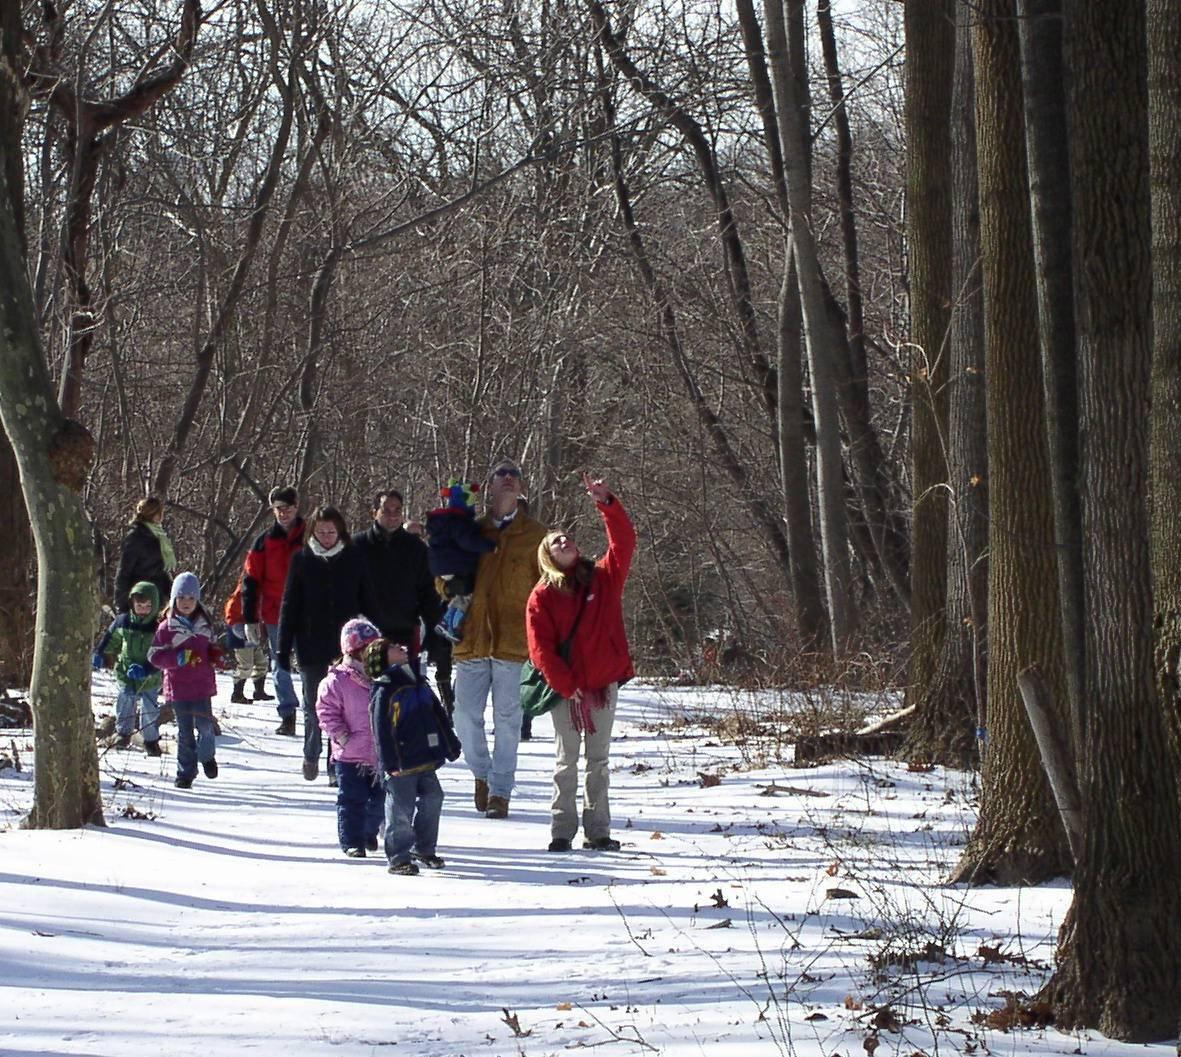 d6ac8c613d9634d55f05_February_Festivites__Winter_Walks_.jpg